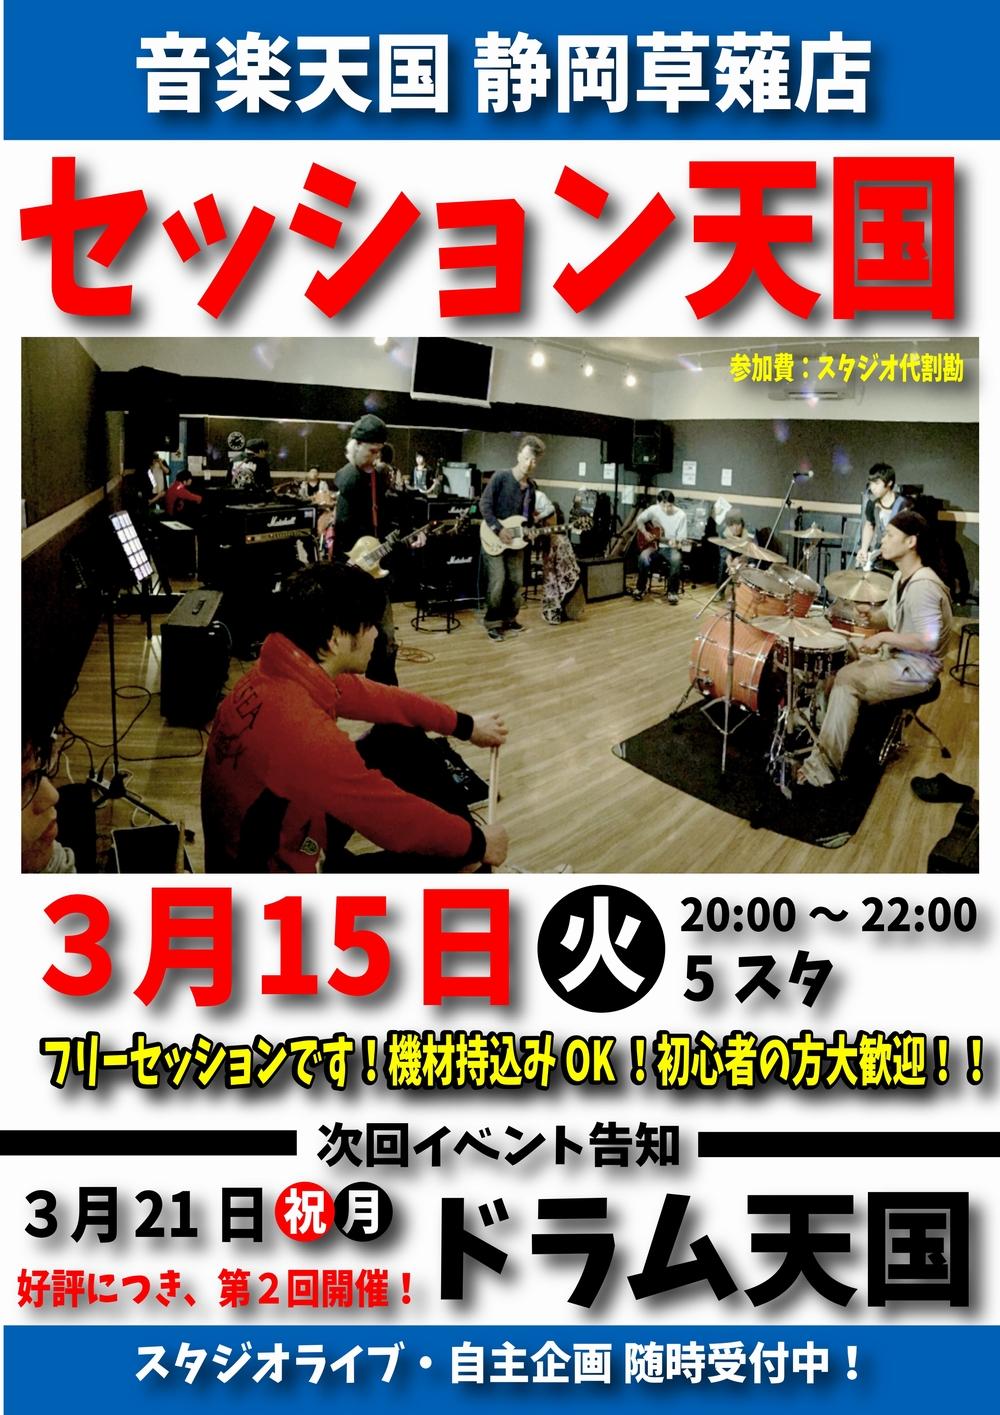 【セッション天国】音楽天国・静岡草薙店3月15日(火)開催